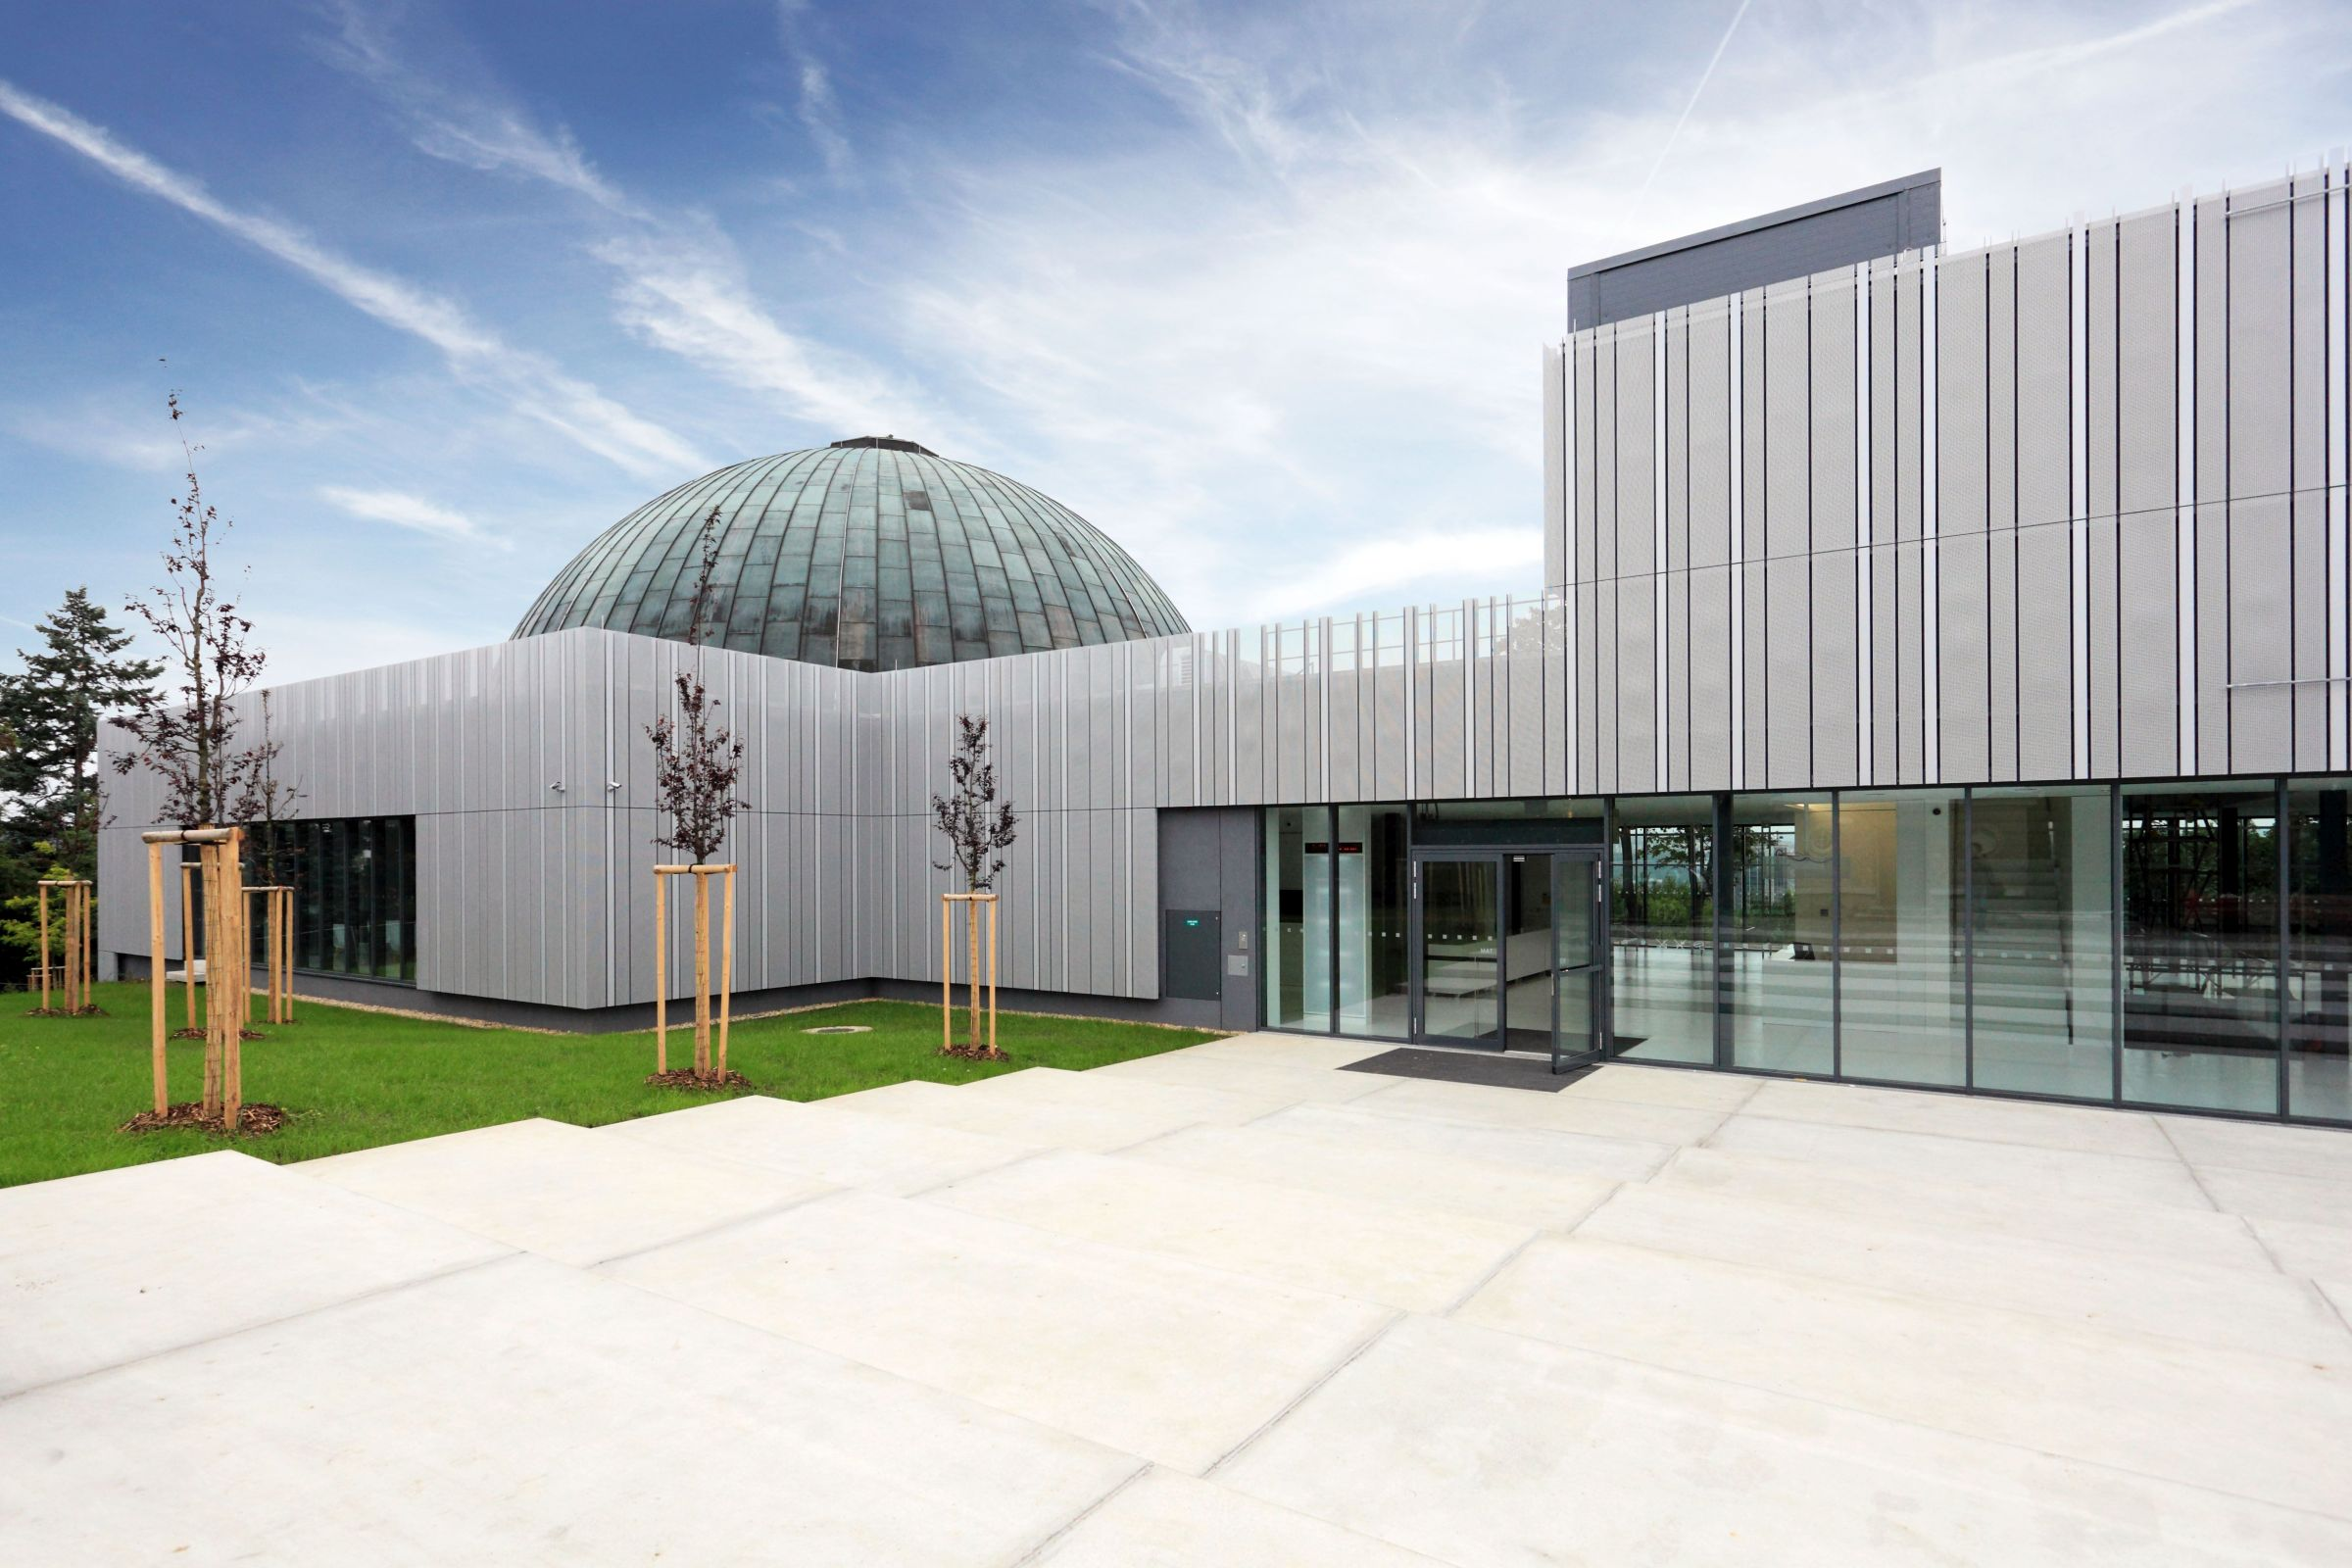 Brno Observatory and Planetarium in Brno